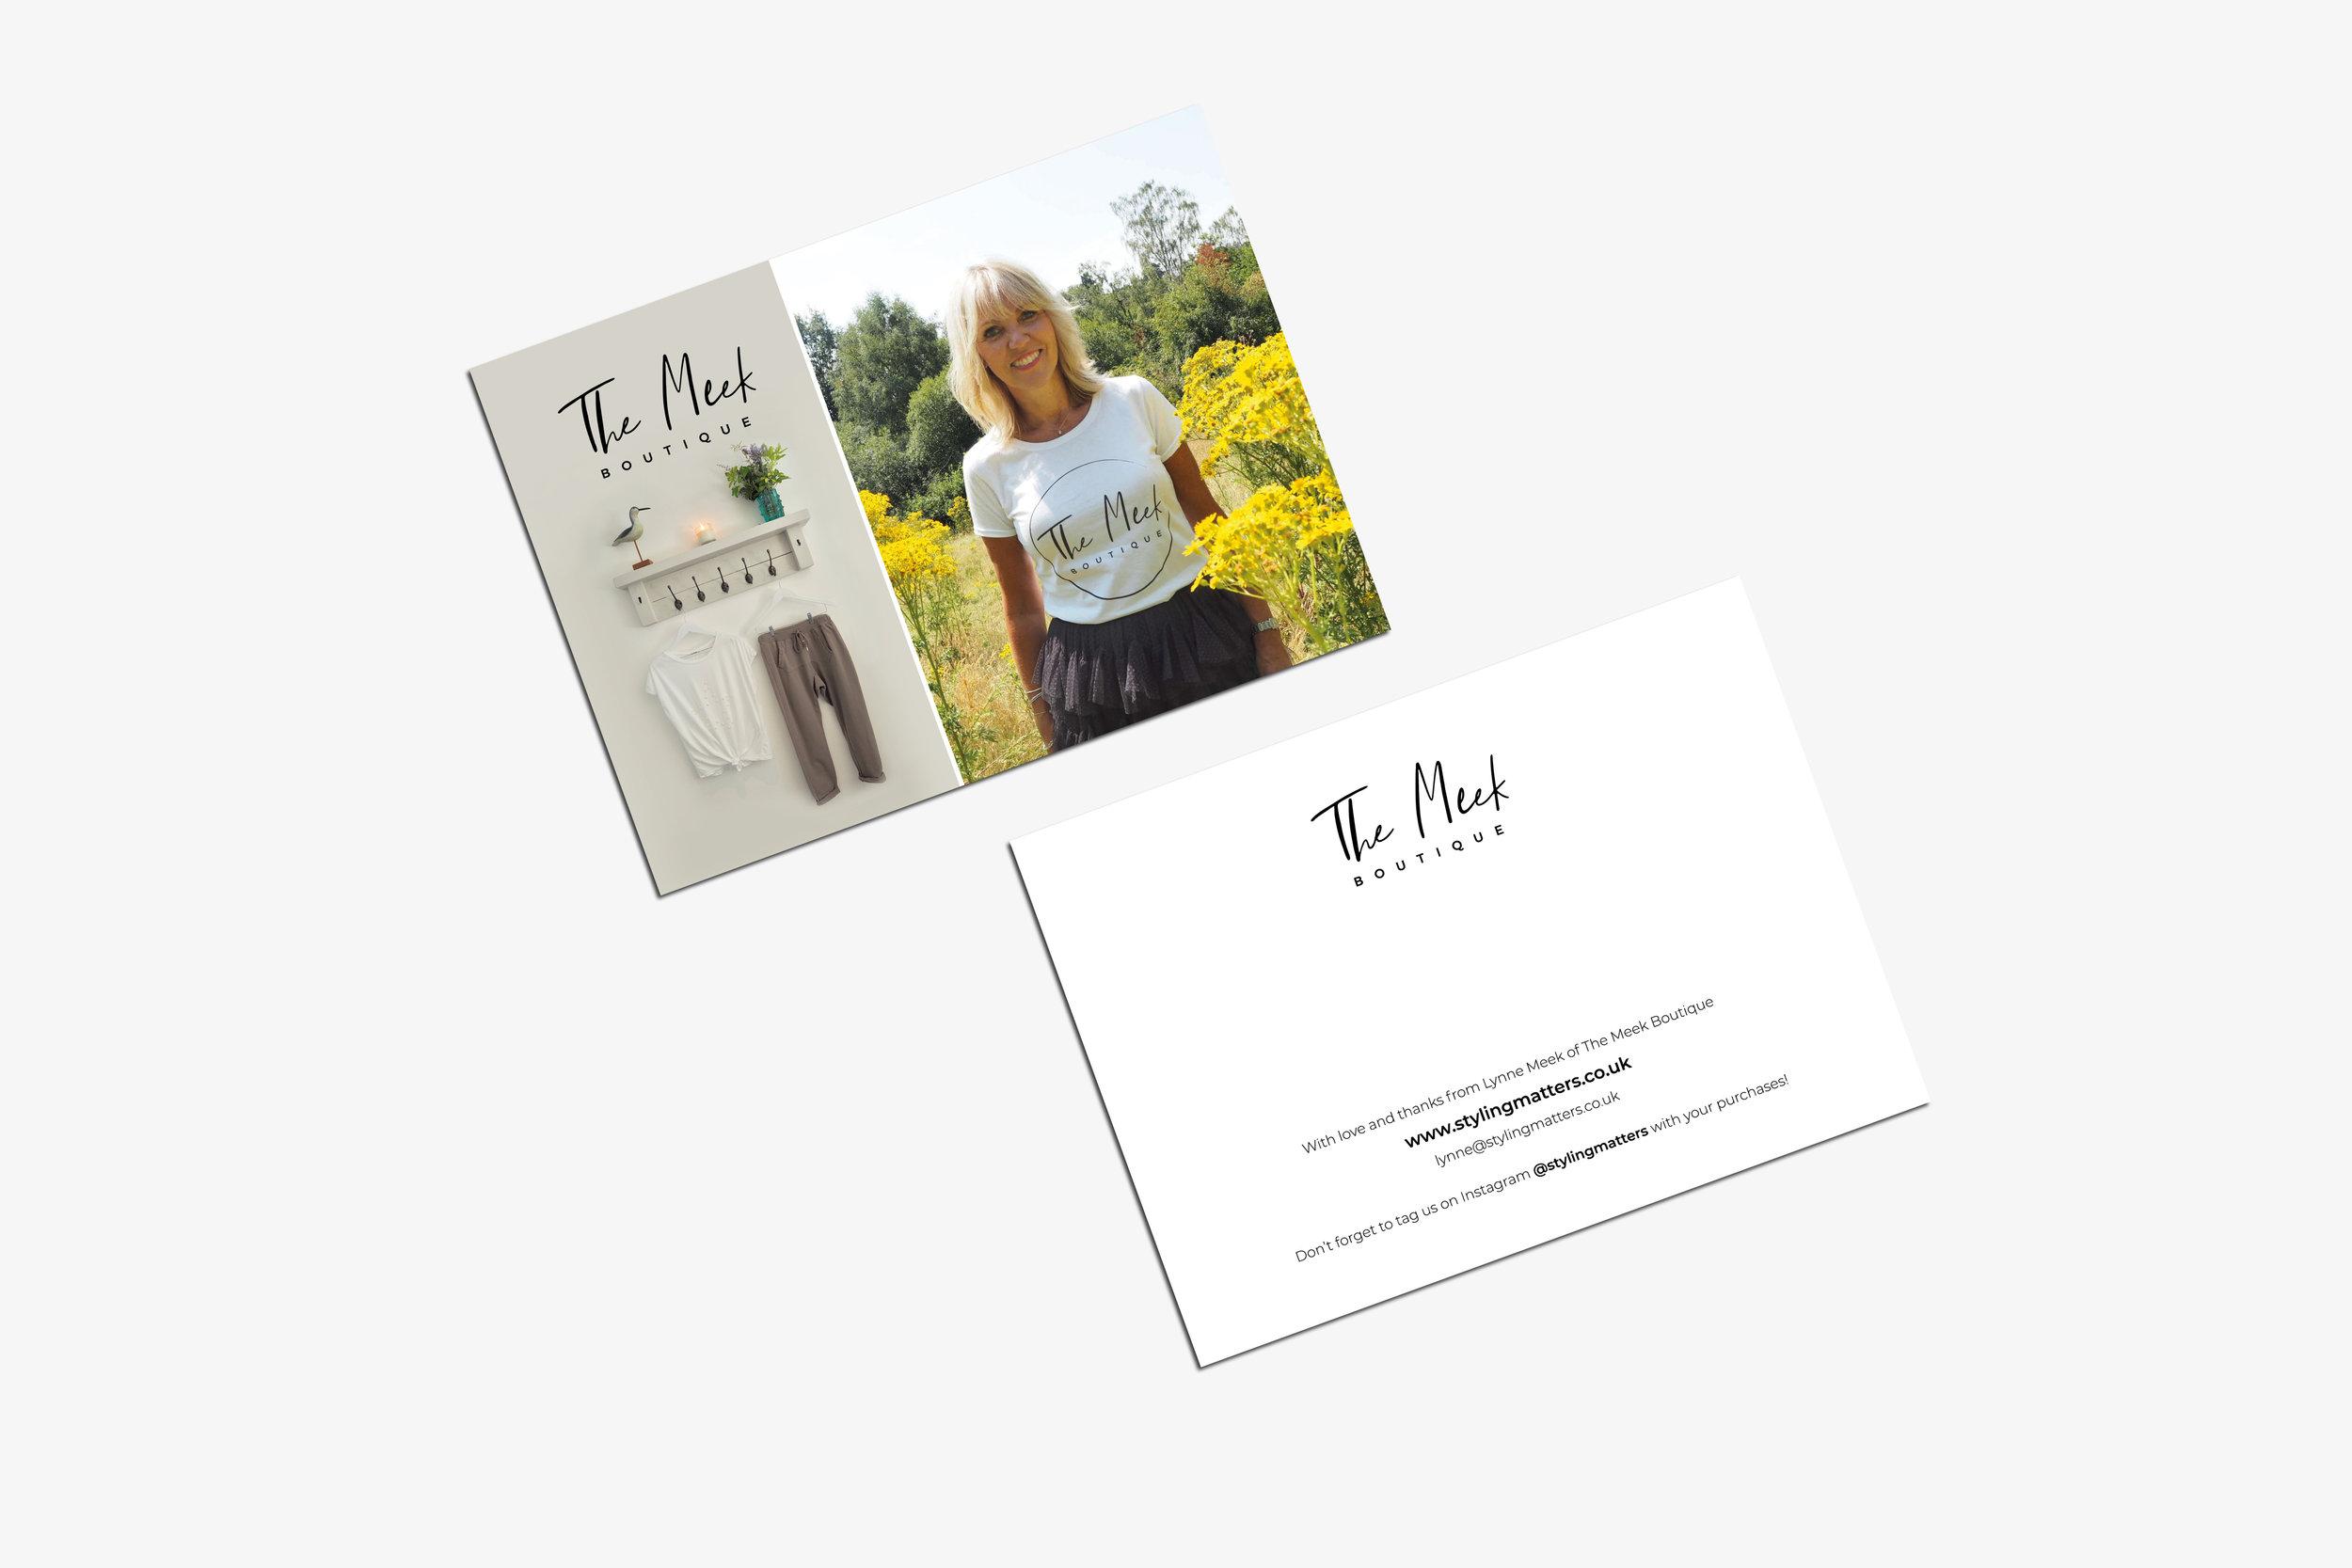 TMB A6 Card-template.jpgThe Meek Boutique A6 Postcard Design